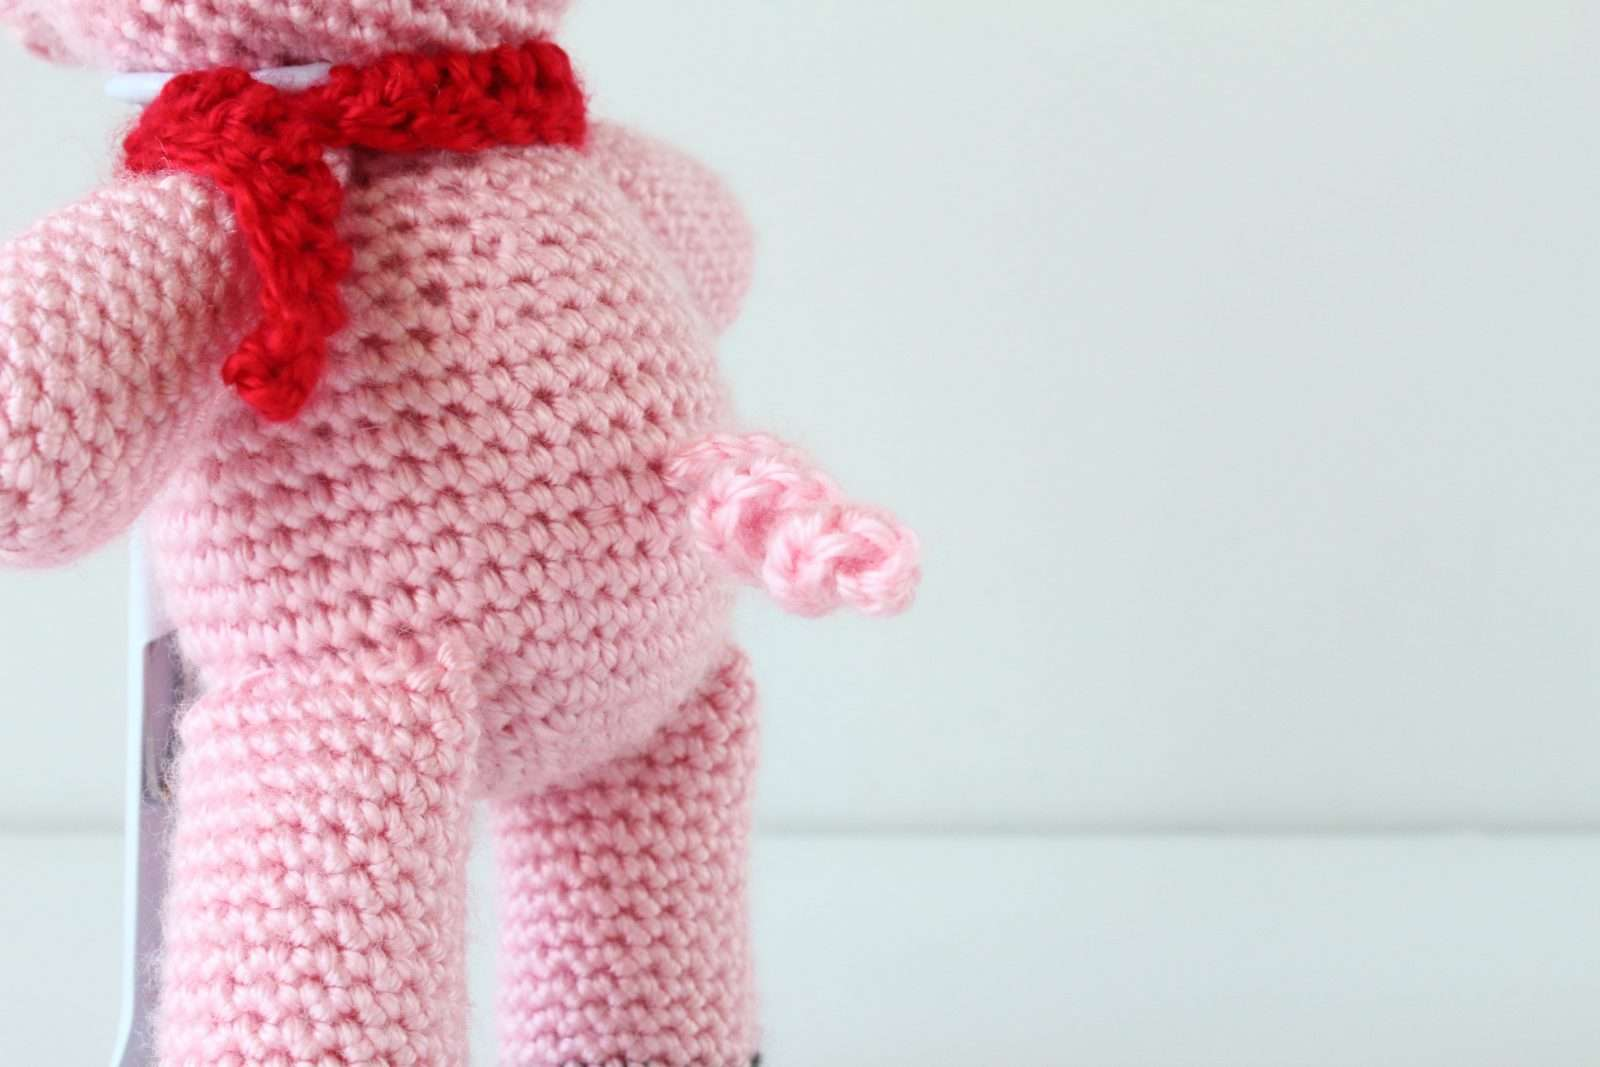 Freebie Friday: Piglet Crochet Pattern • One's Creative Mind | 1067x1600